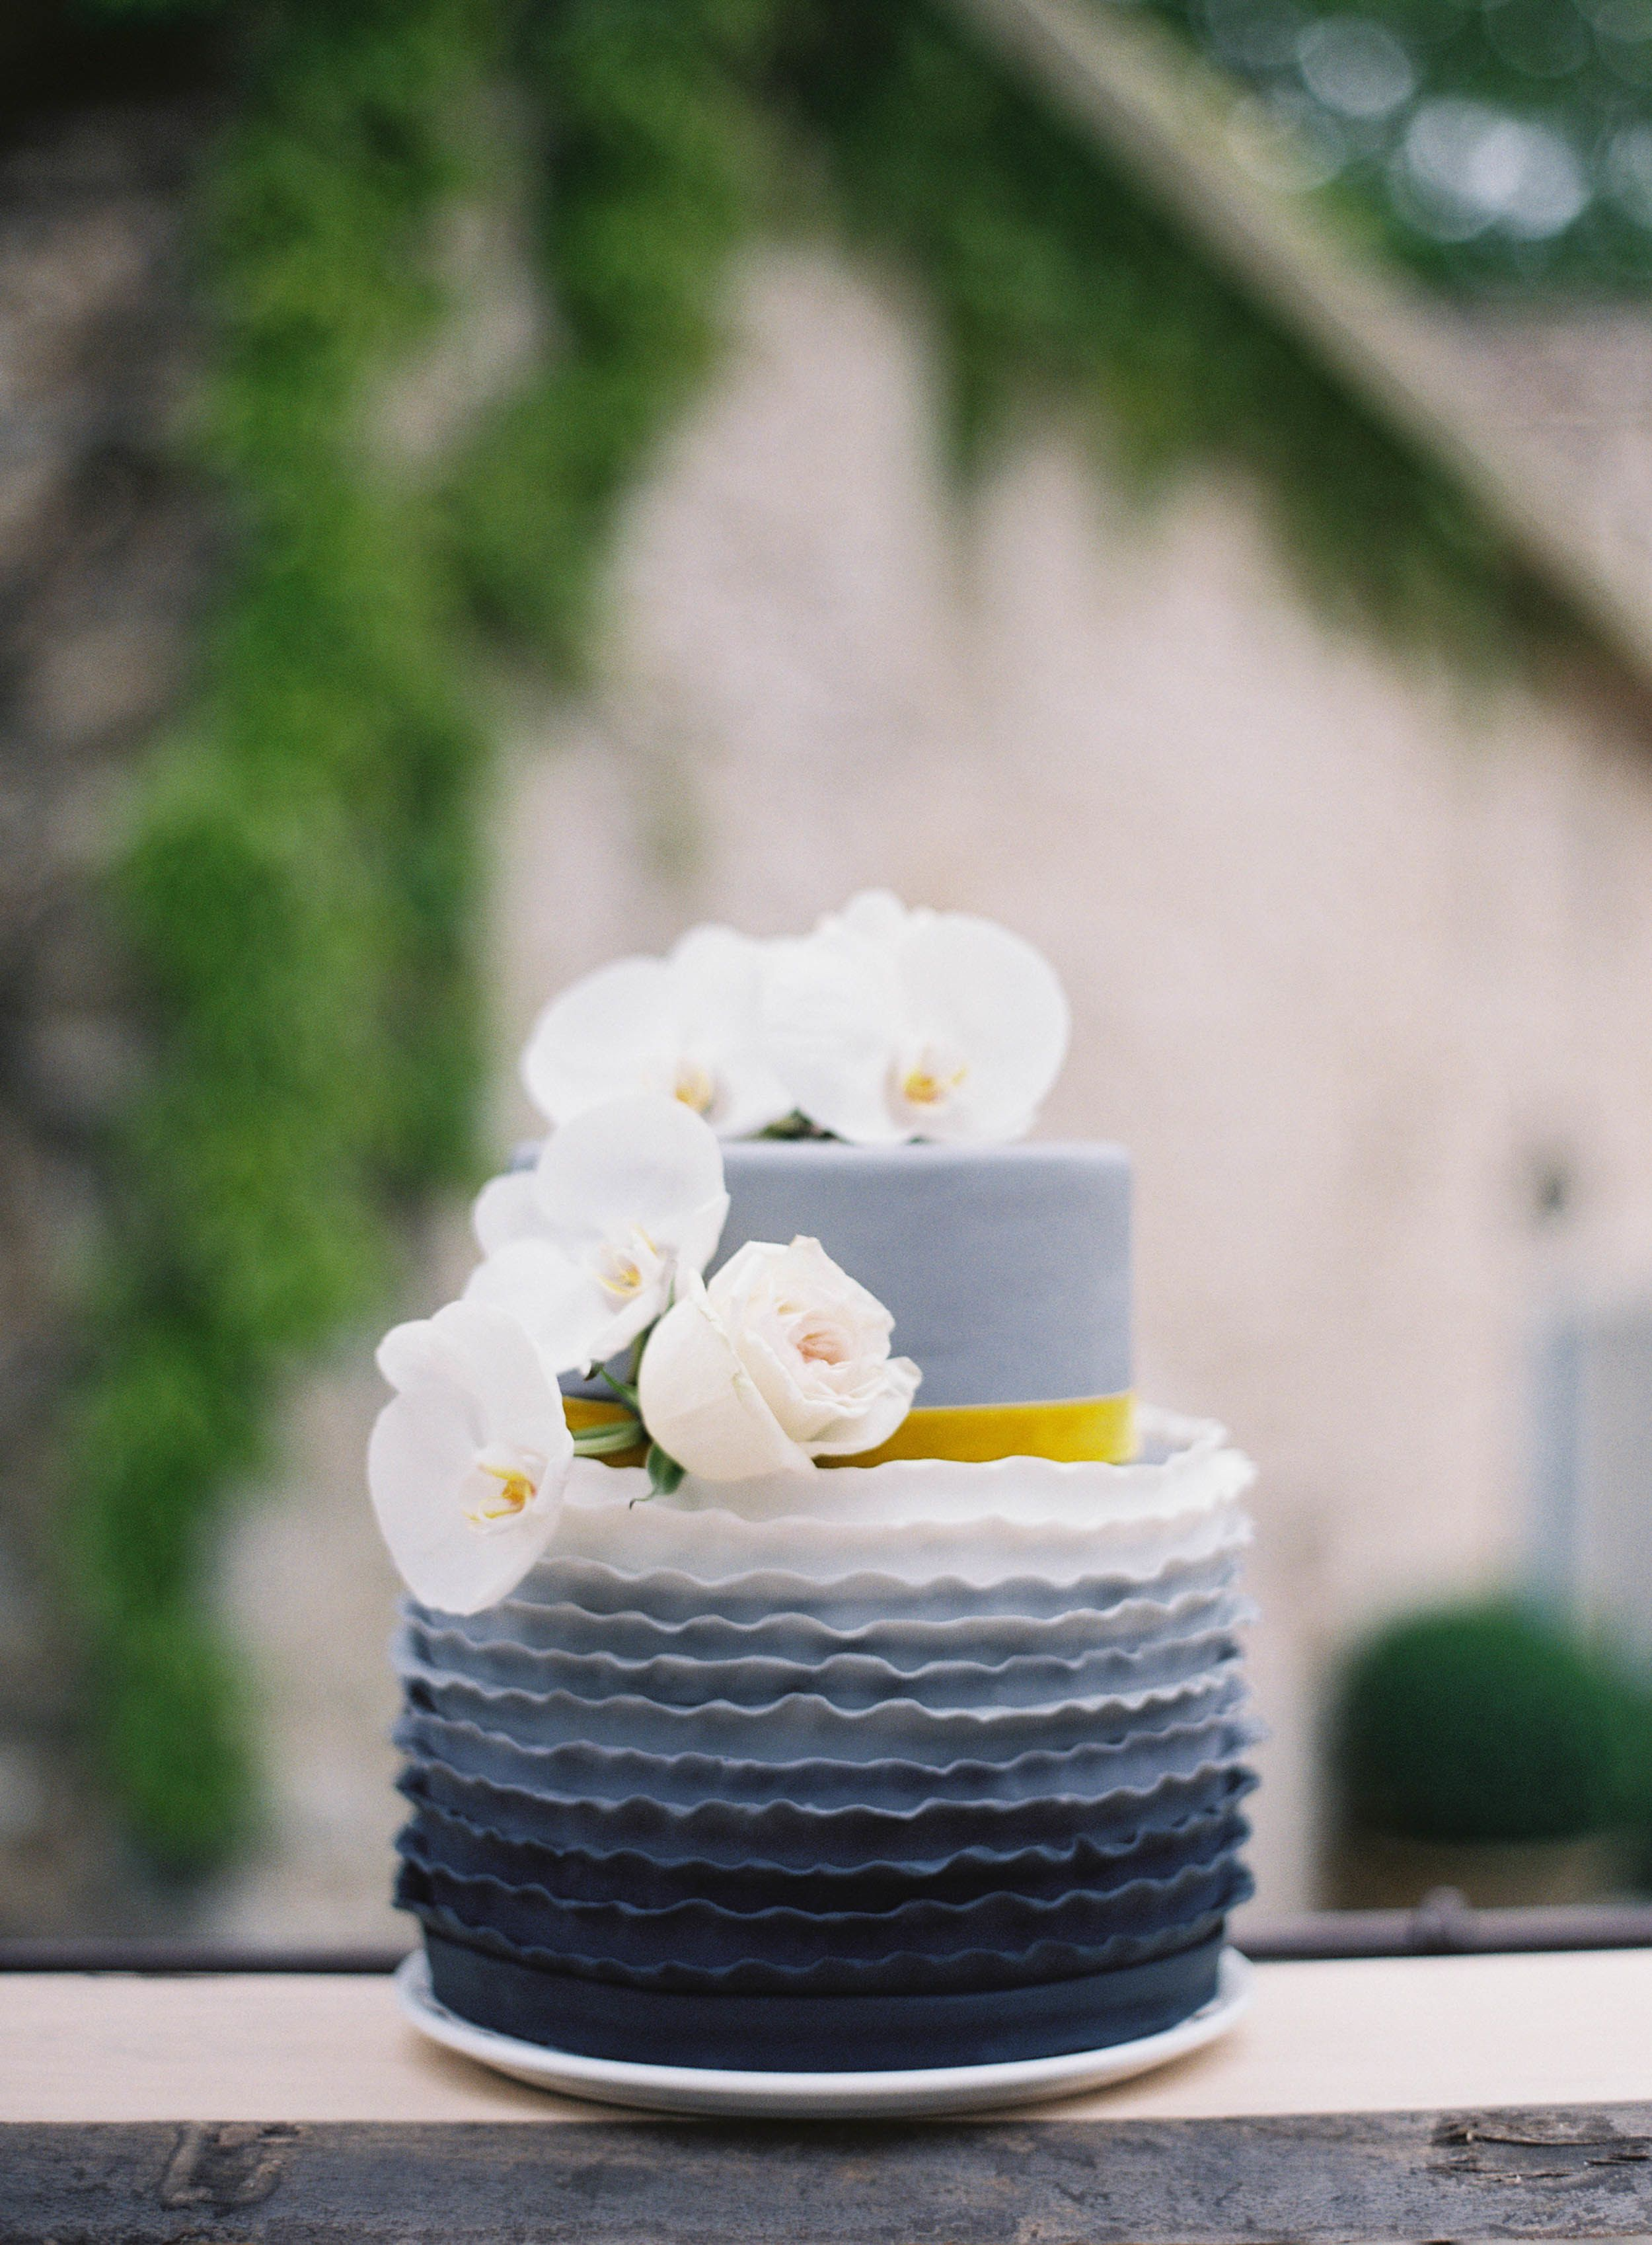 Photography: Greg Finck Photography - gregfinck.com Read More: http://www.stylemepretty.com/destination-weddings/france-weddings/2015/05/05/posh-grey-gold-provencal-wedding-inspiration/